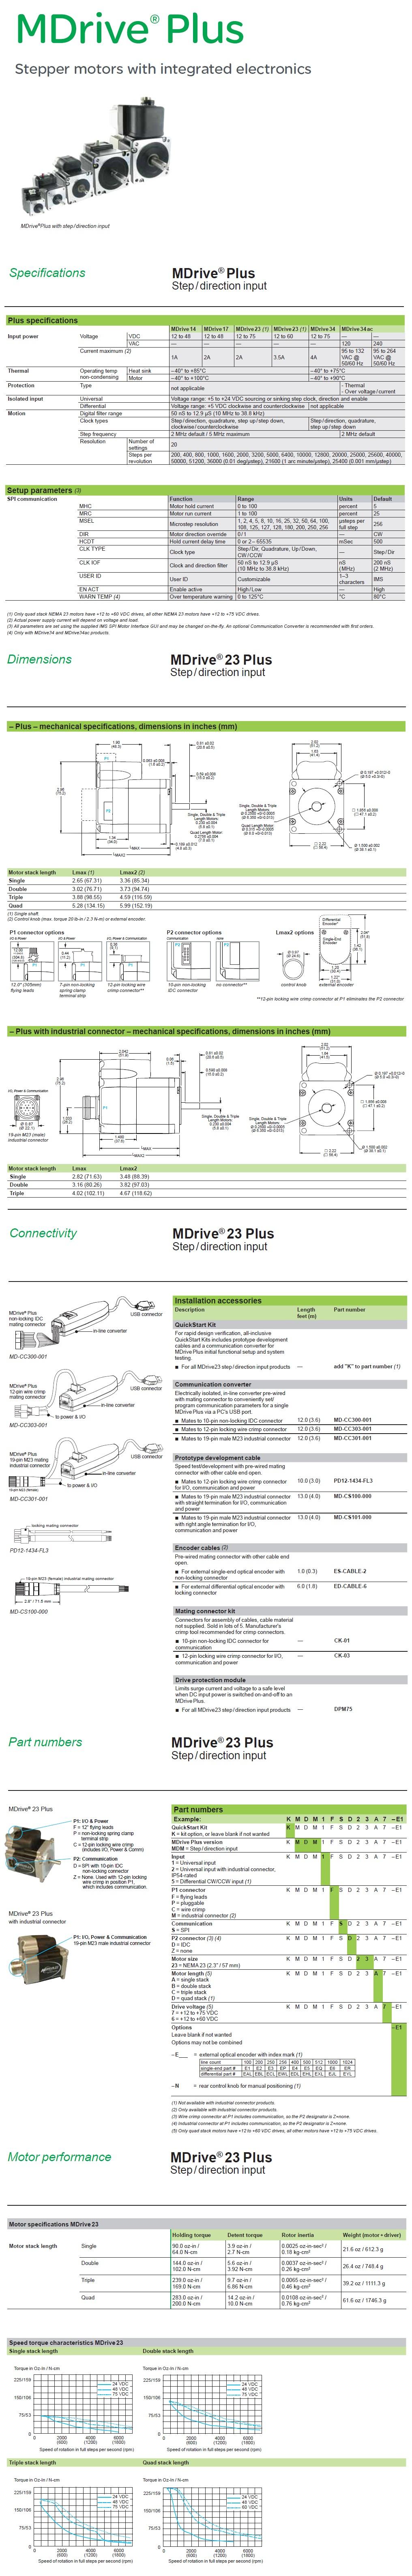 Schneider Electric: MDrive® Plus Step/Direction Input (NEMA 23)